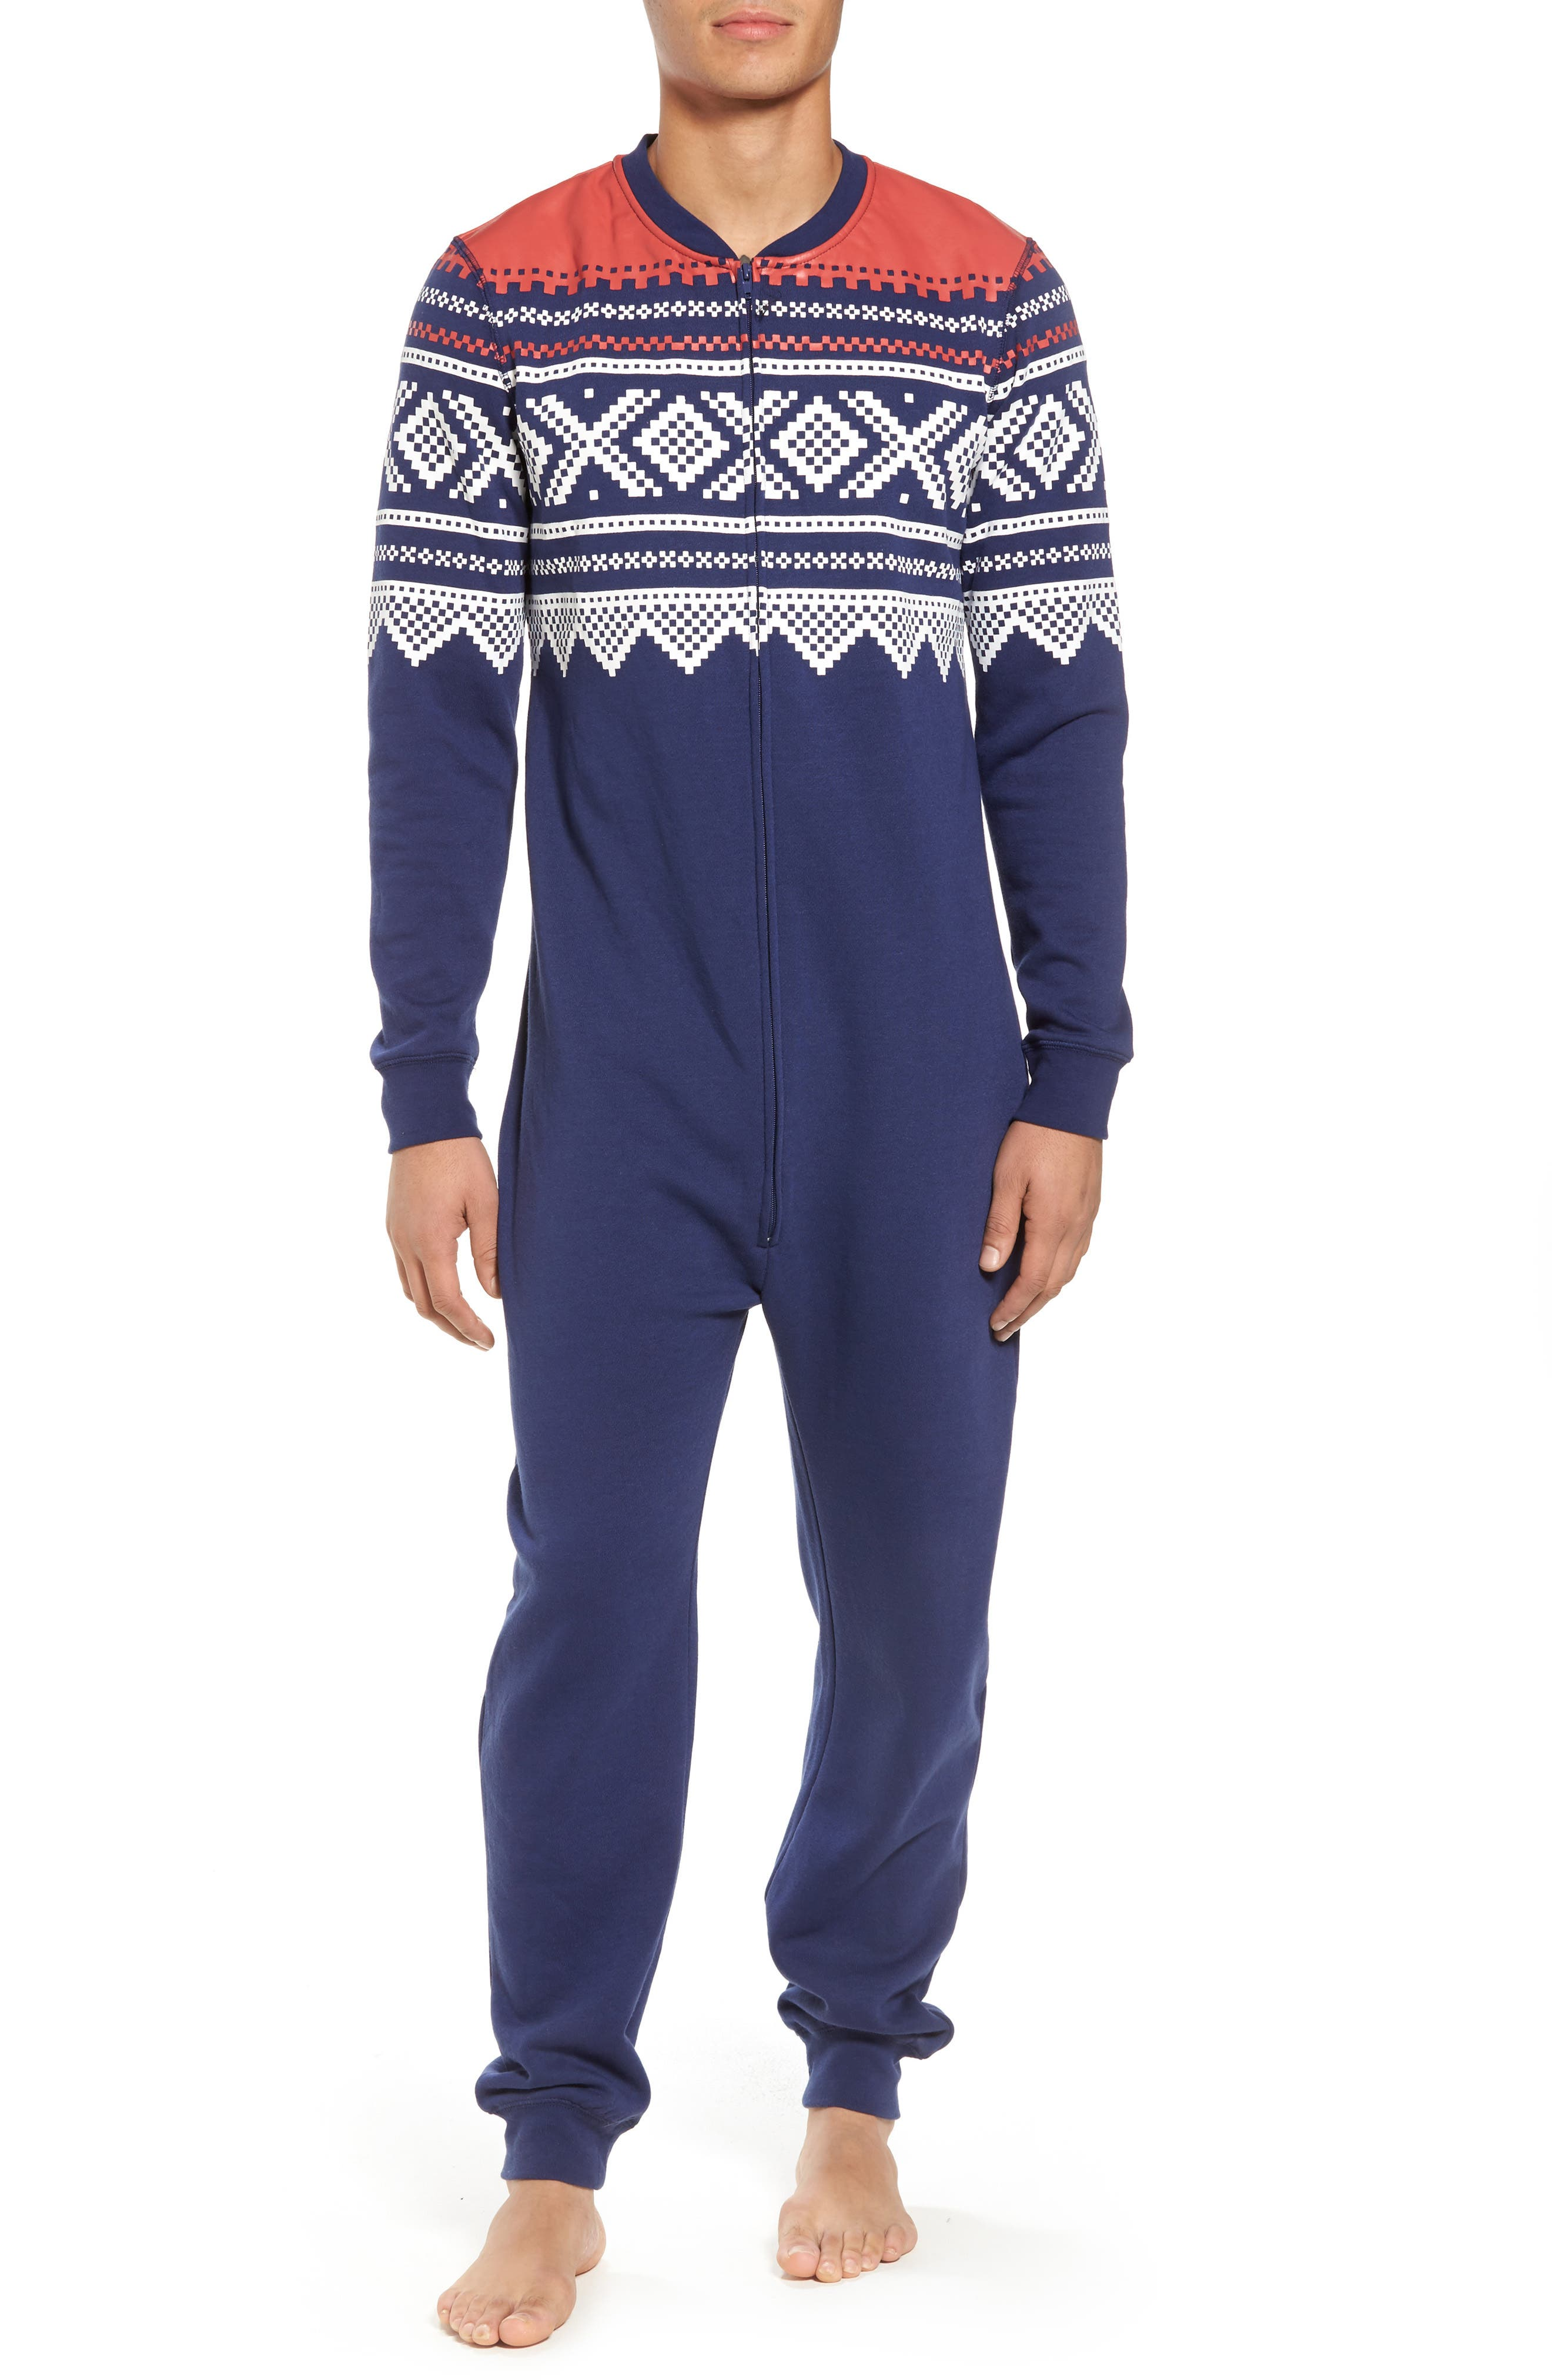 Fleece One-Piece Pajamas,                         Main,                         color, 040